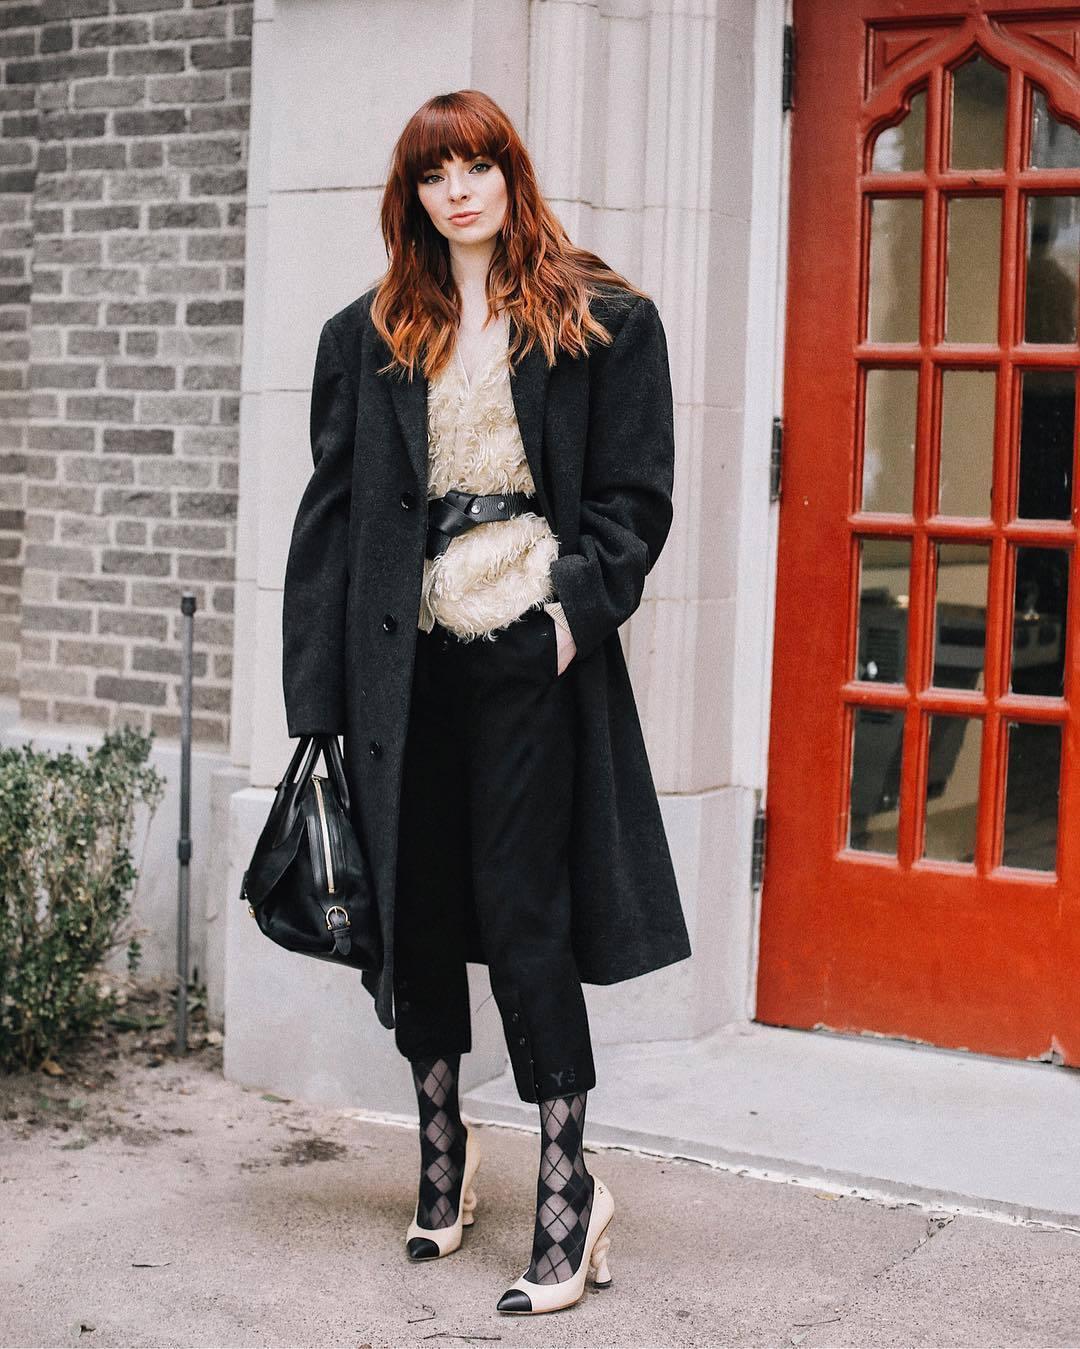 shoes pumps chanel tights black pants straight pants capri pants black bag oversized coat fuzzy sweater prada black belt